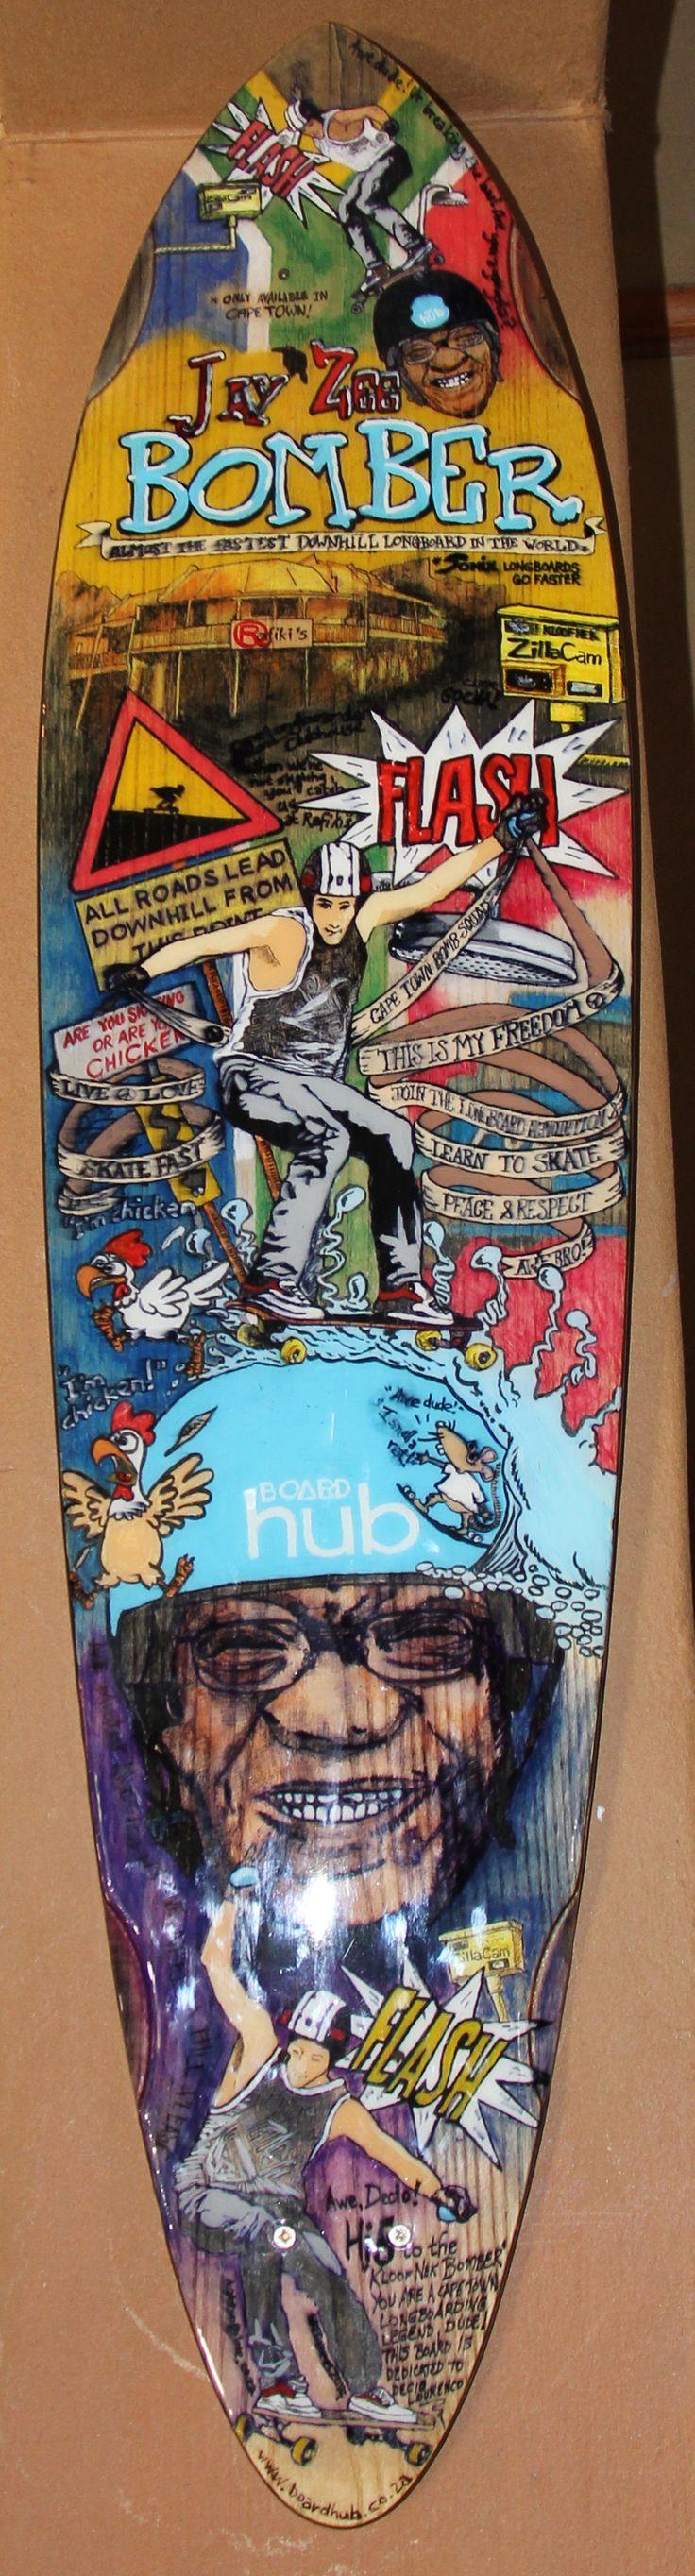 longboarding boardhub cape town rafikis